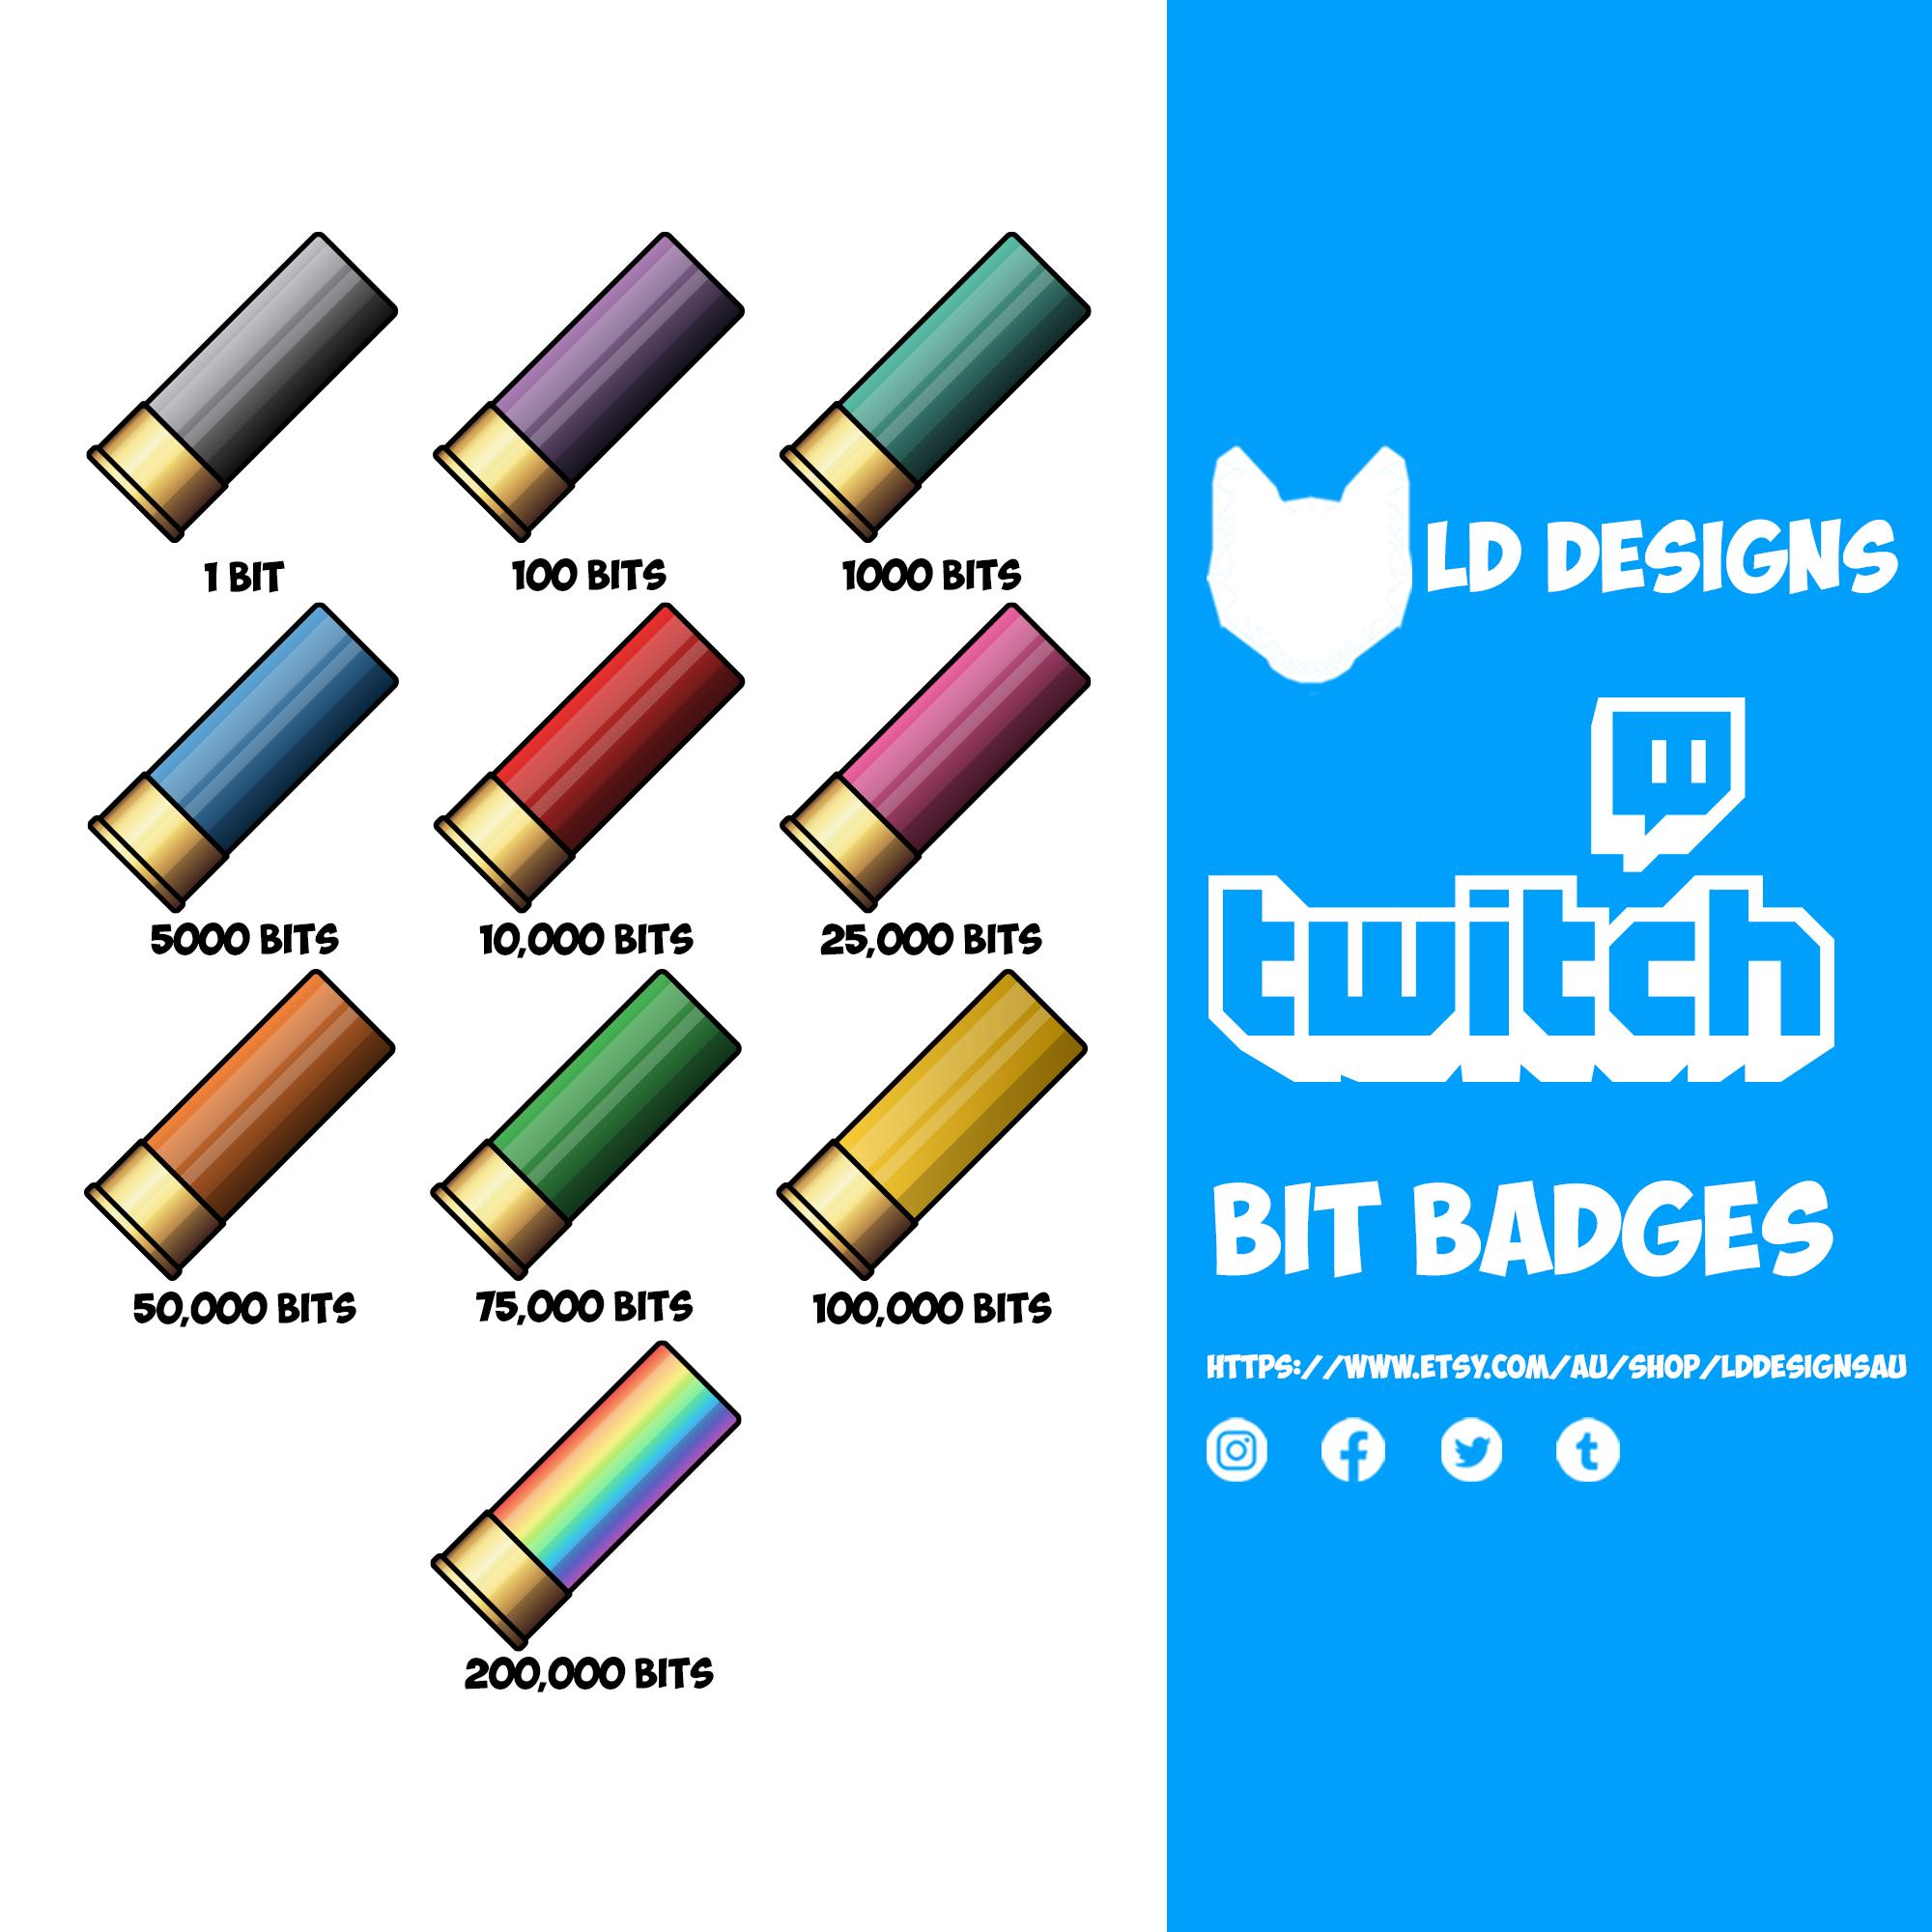 Pin On Twitch Sub Badges Bit Badges Panels And Emotes